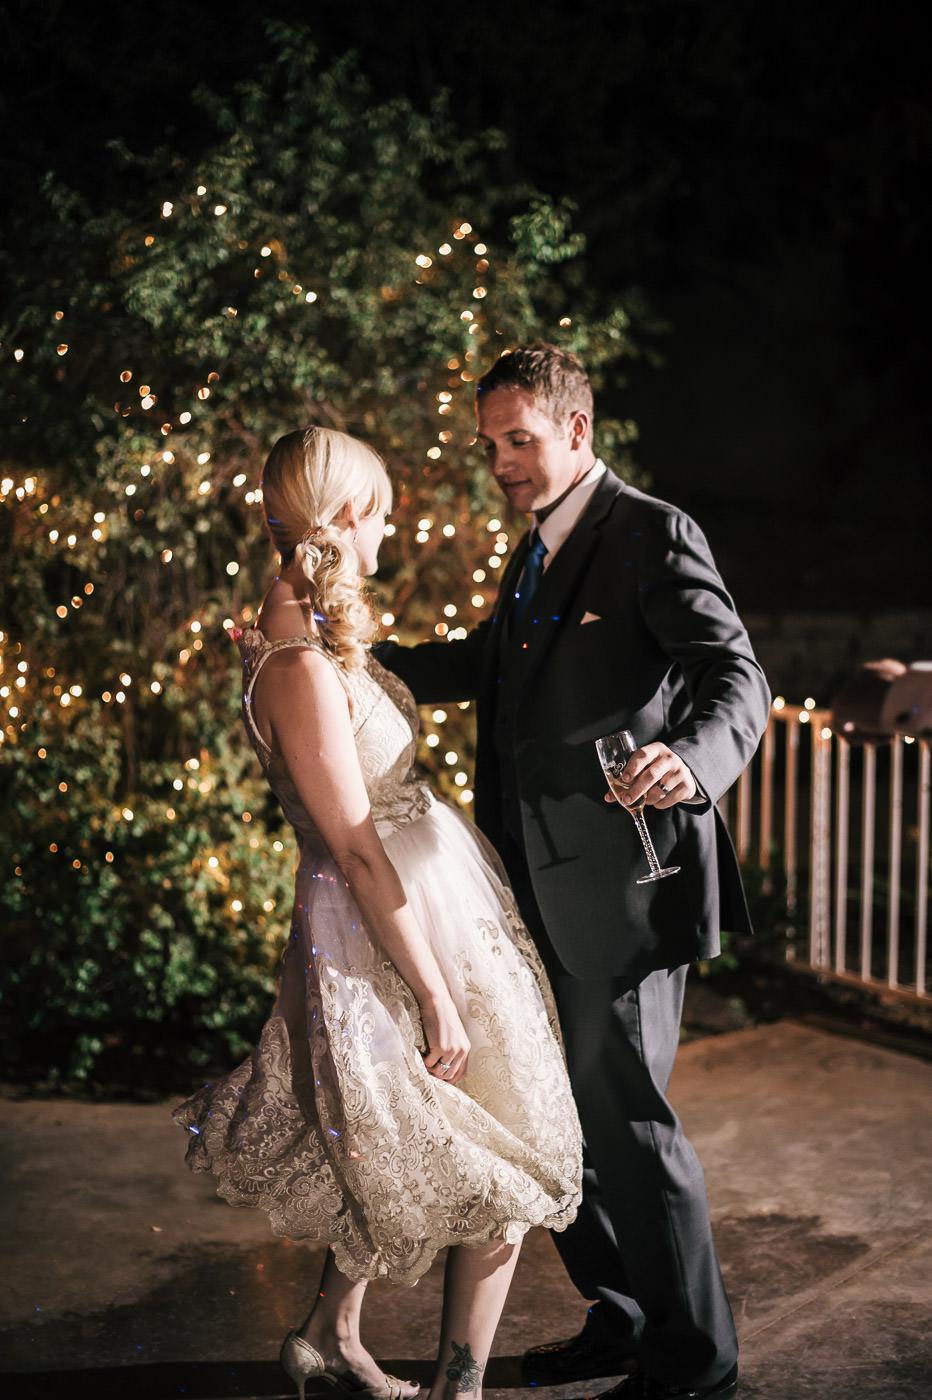 newlyweds tear up the dance floor at their wedding reception